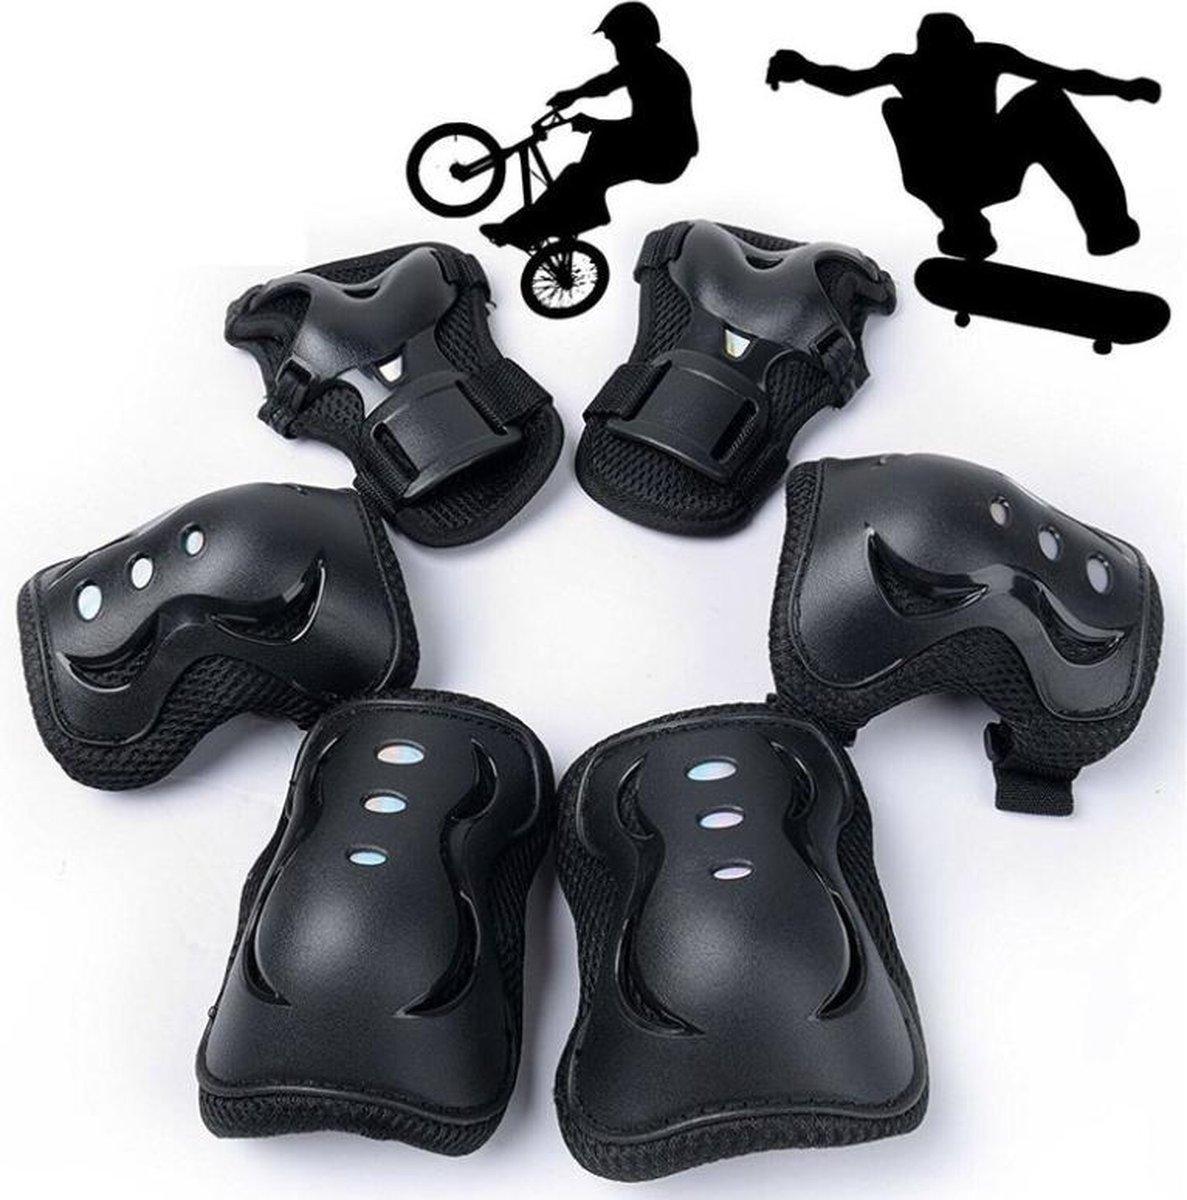 Universele sport beschermset - 6 delig - Skeeler / skate bescherming - 3 in 1 - Elleboog / pols en kniebeschermers - Valbescherming skateboard - Voor fiets, step pads -Zwart